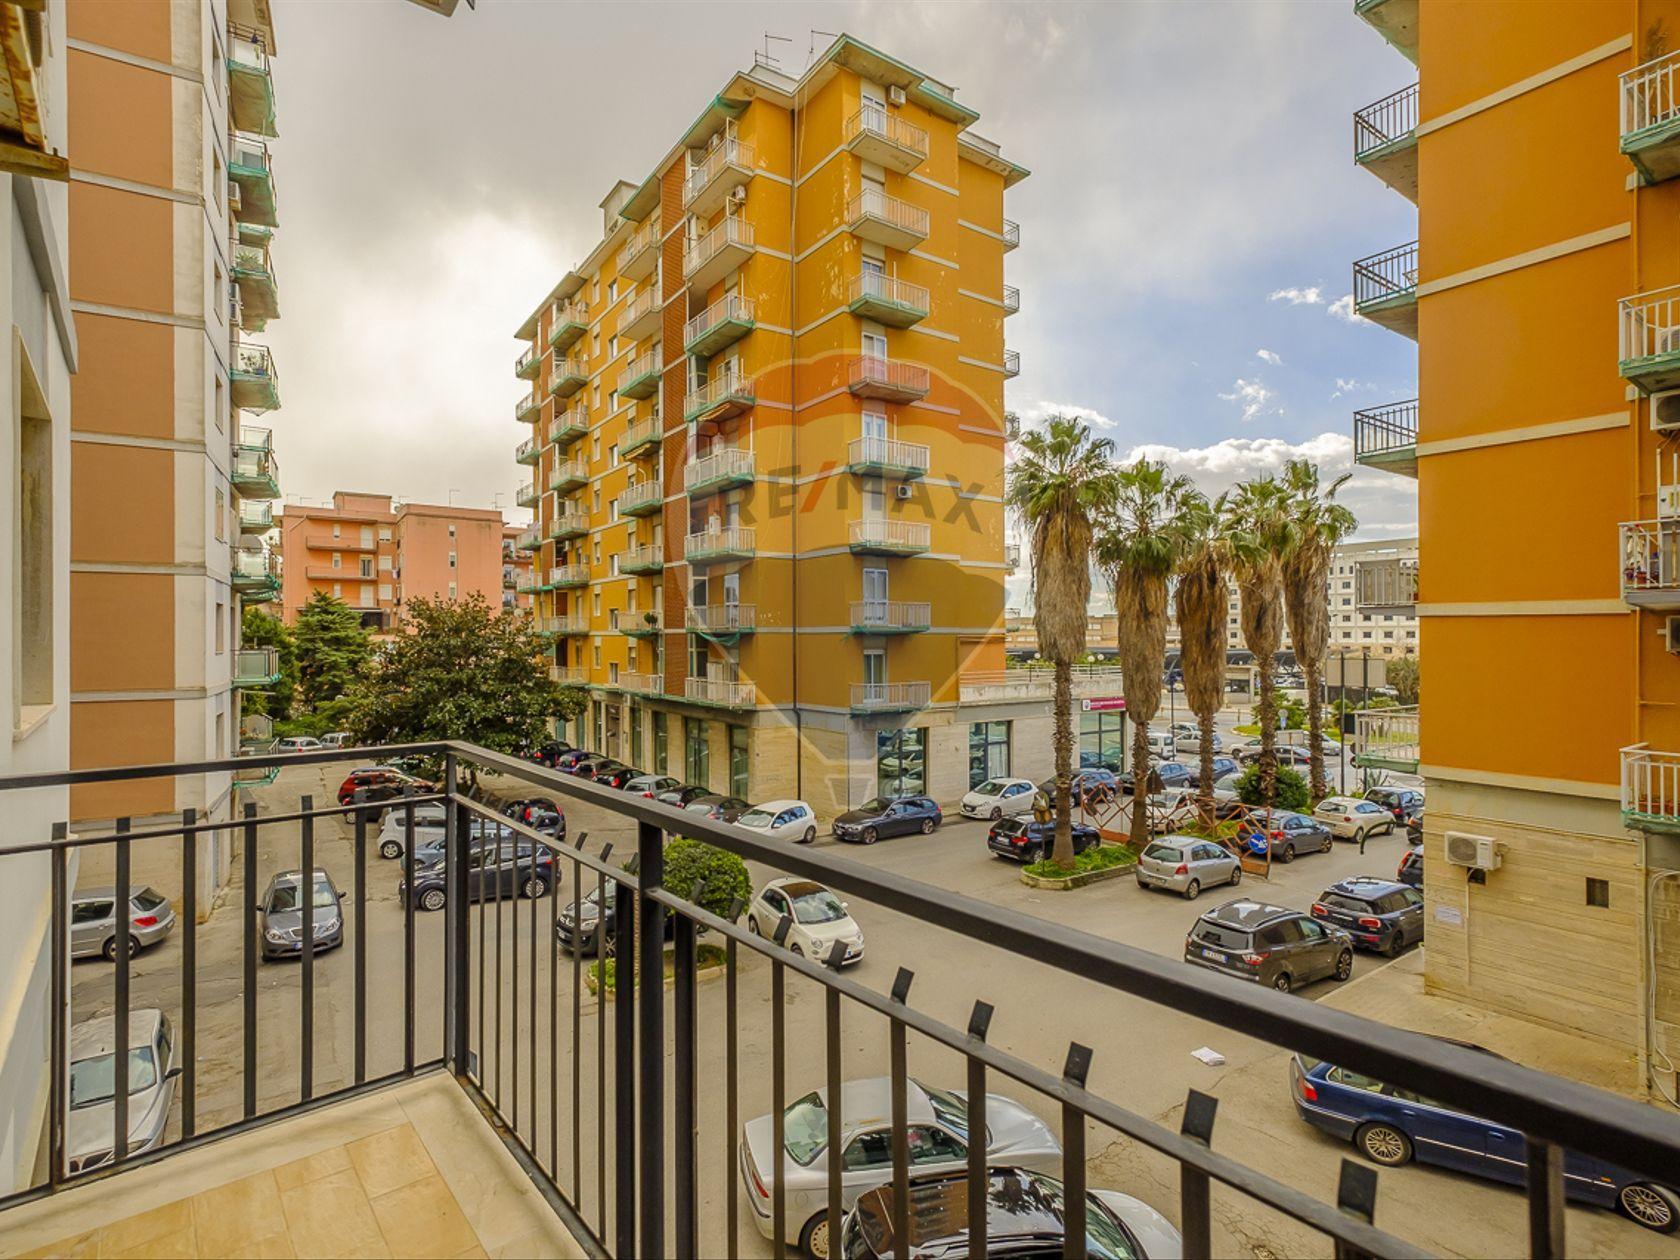 Appartamento Siracusa- Scala Greca S. Panagia Teracati Zecchino, Siracusa, SR Vendita - Foto 16